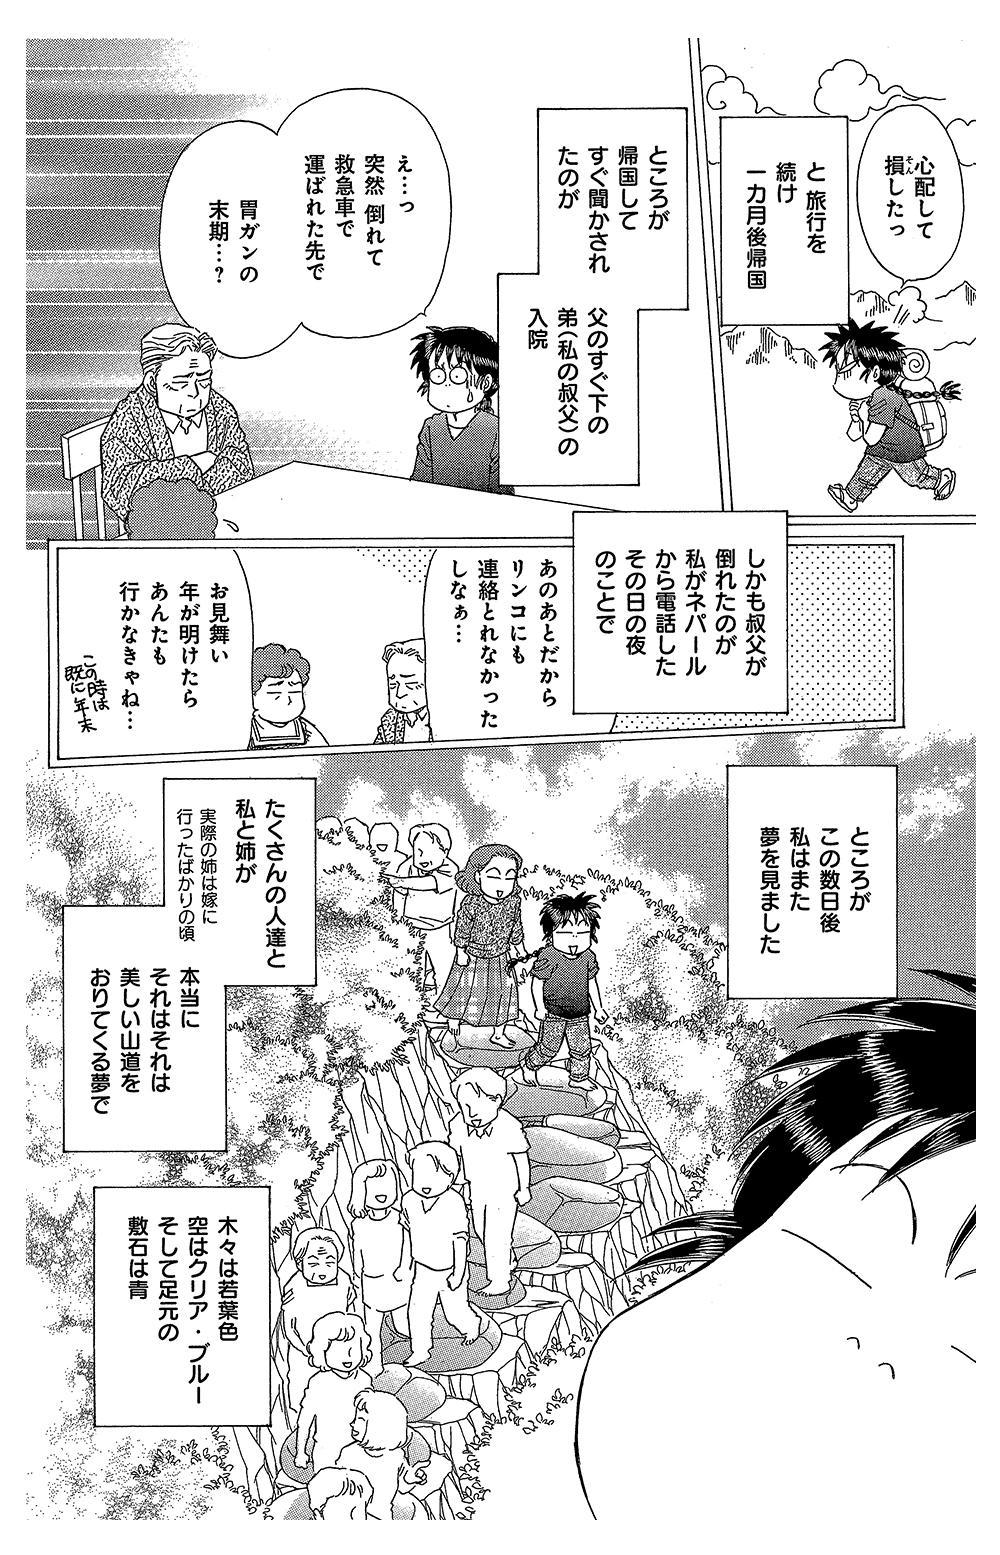 okaruto2-1-8.jpg